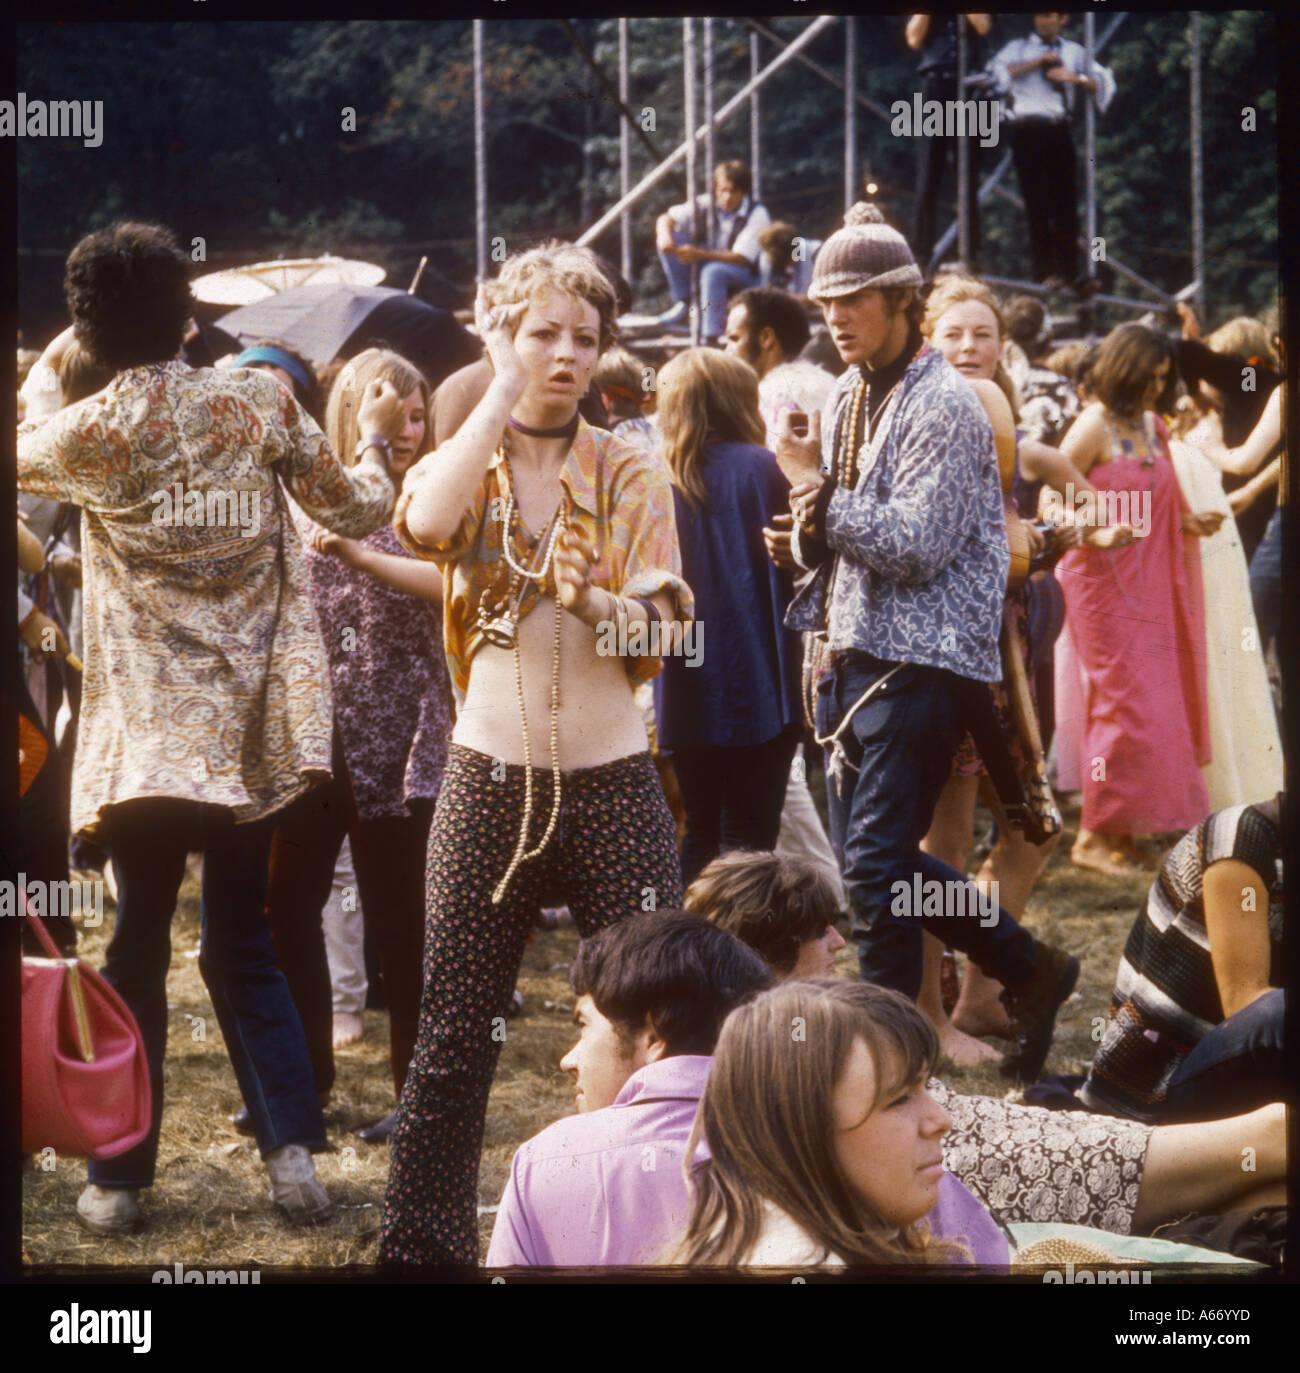 Hippies At Woburn 1967 - Stock Image